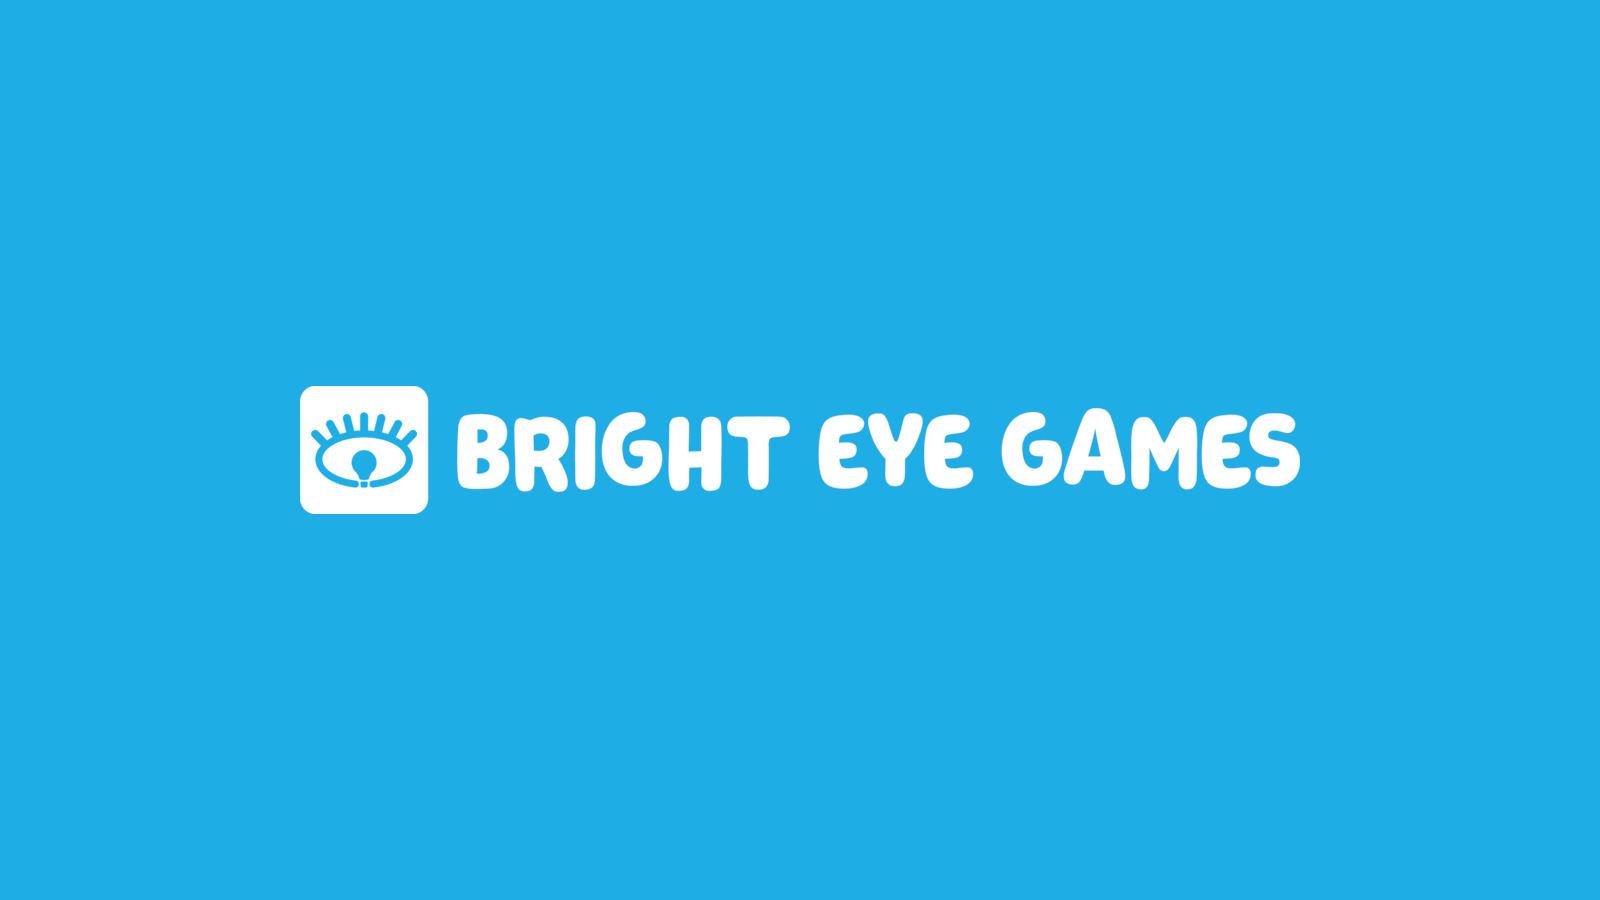 Oltremanica nasce Bright Eye Games